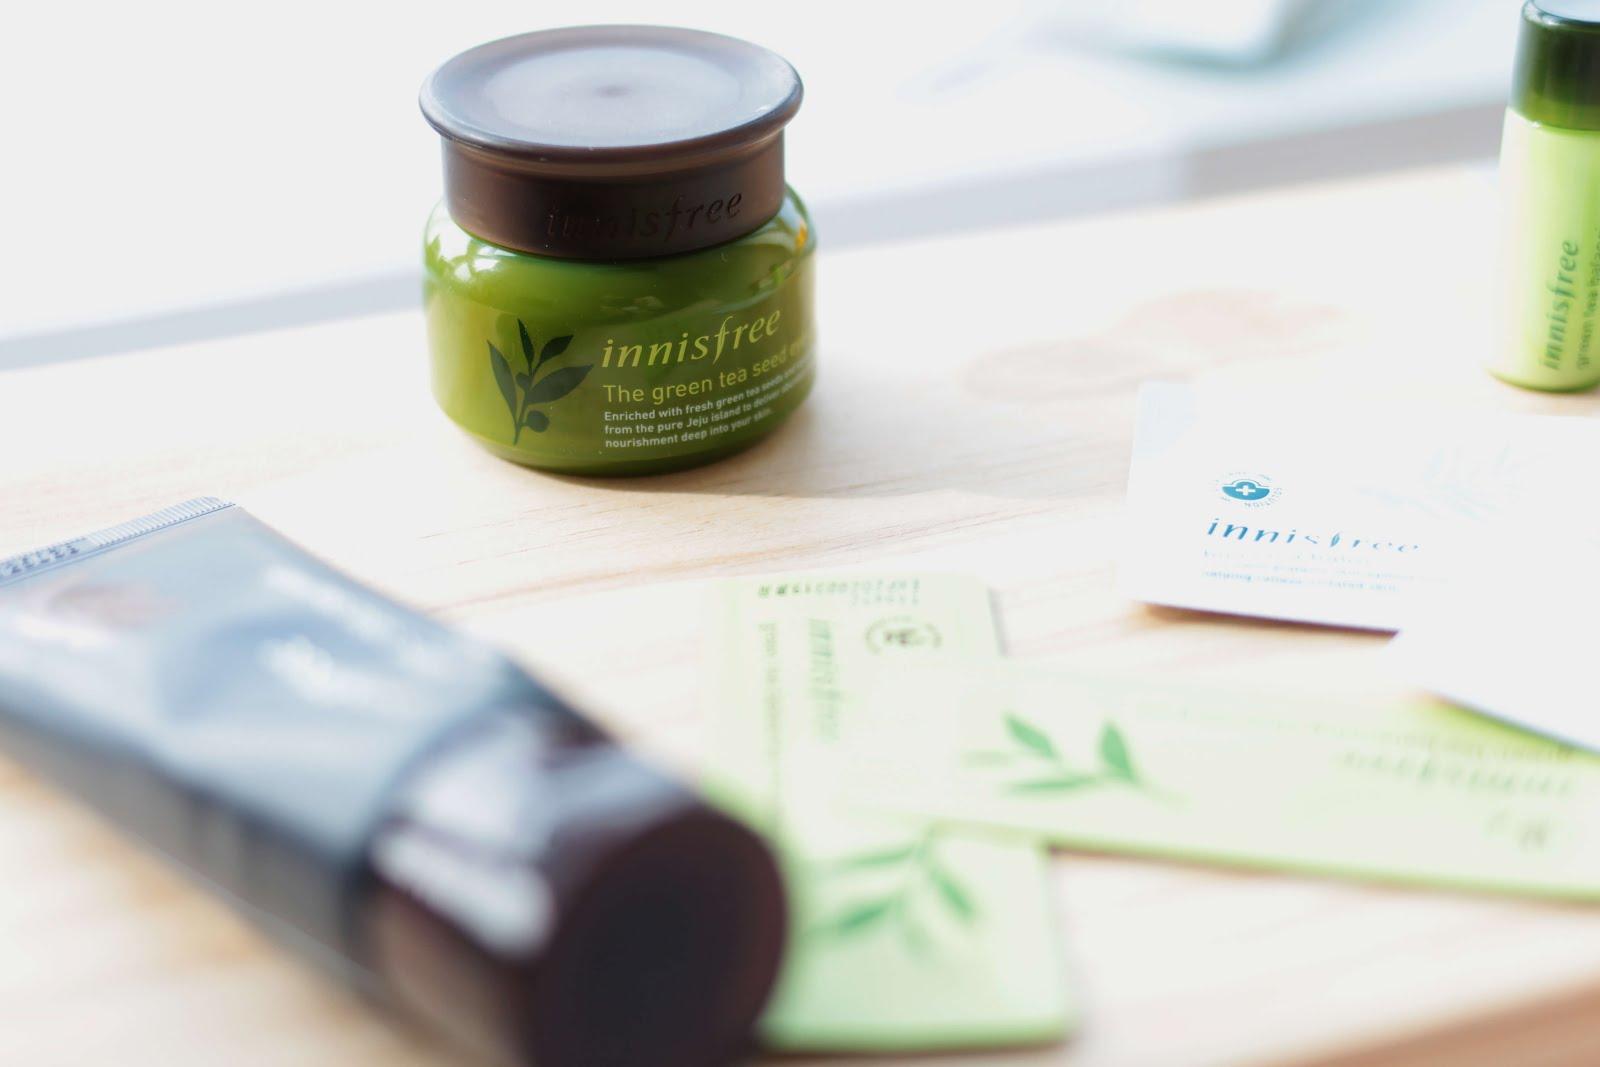 innisfree green tea seed eye cream